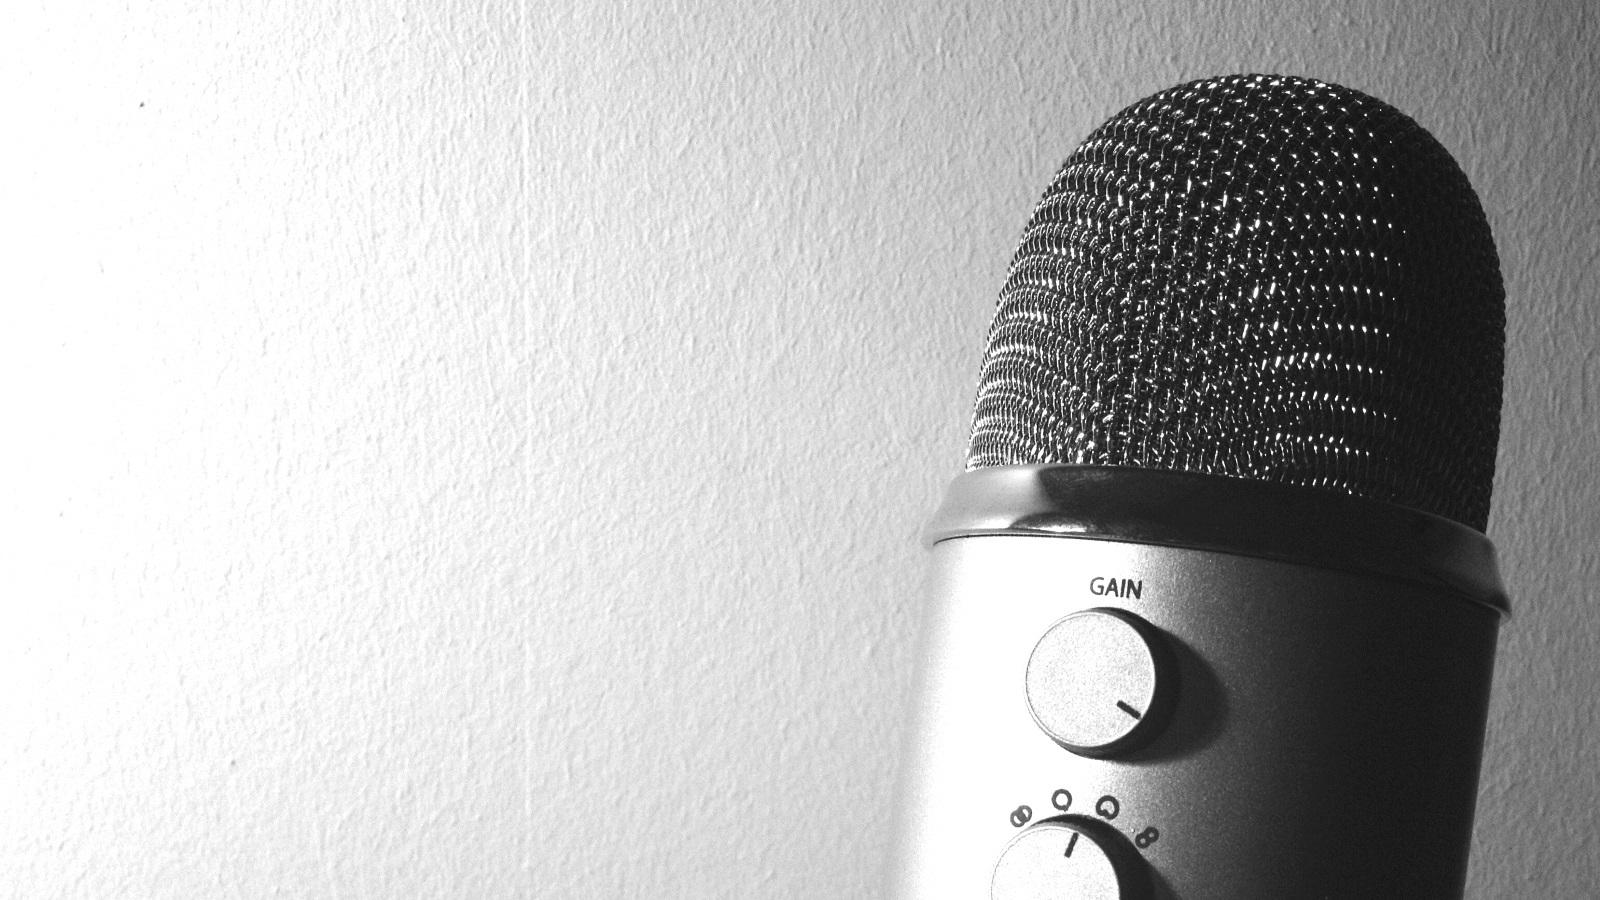 podcast_mikrofon.jpg